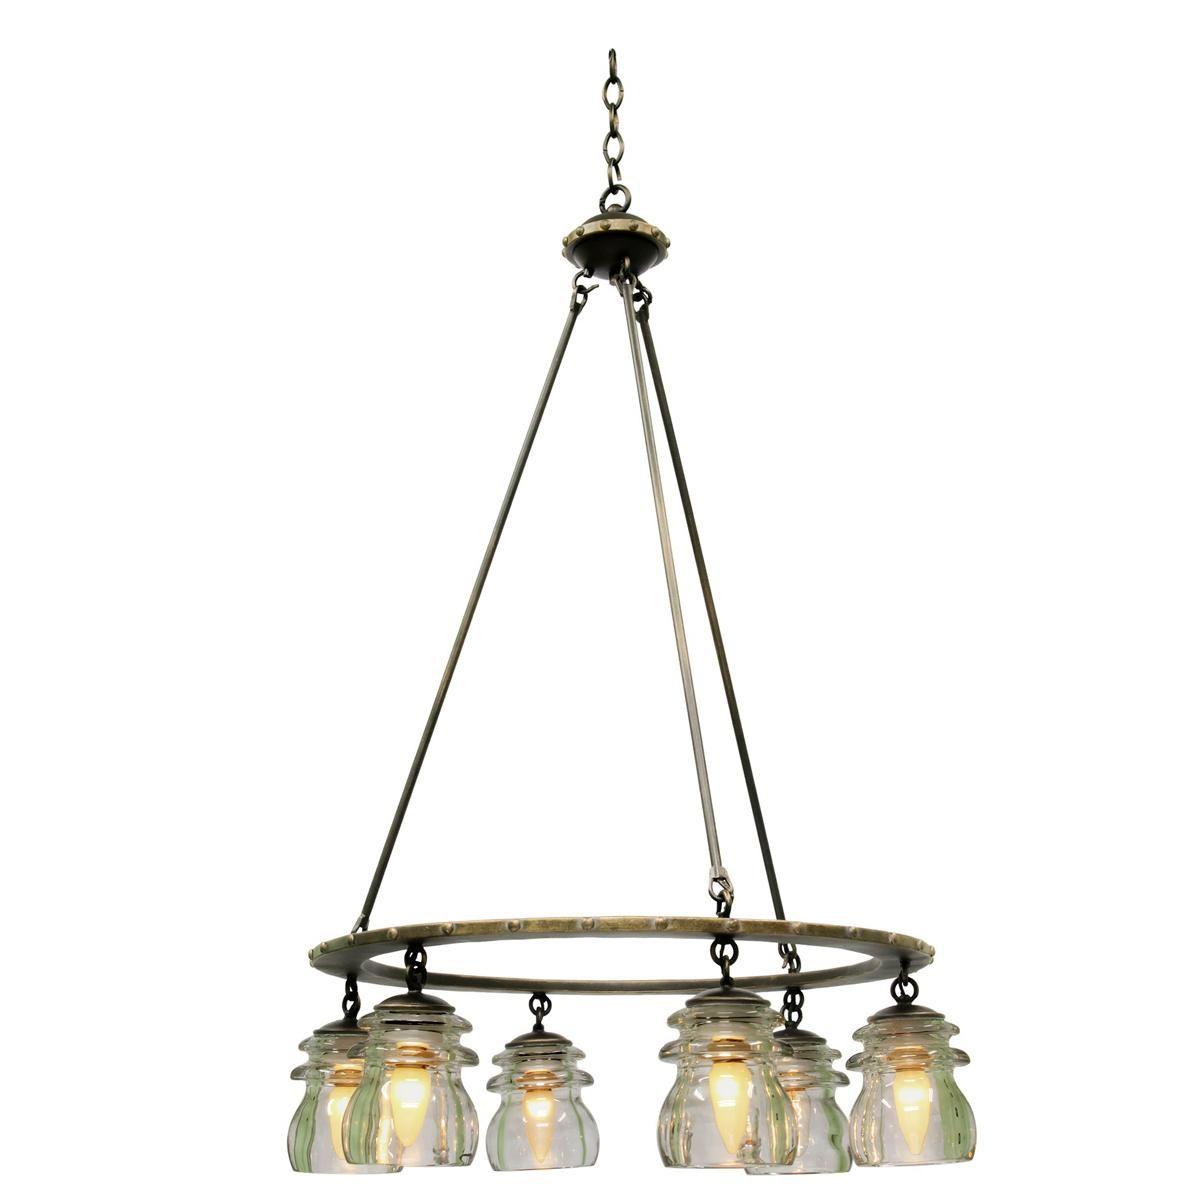 Insulator glass chandelier 6 light chandeliers glass and lights insulator glass 6 light chandelier arubaitofo Images